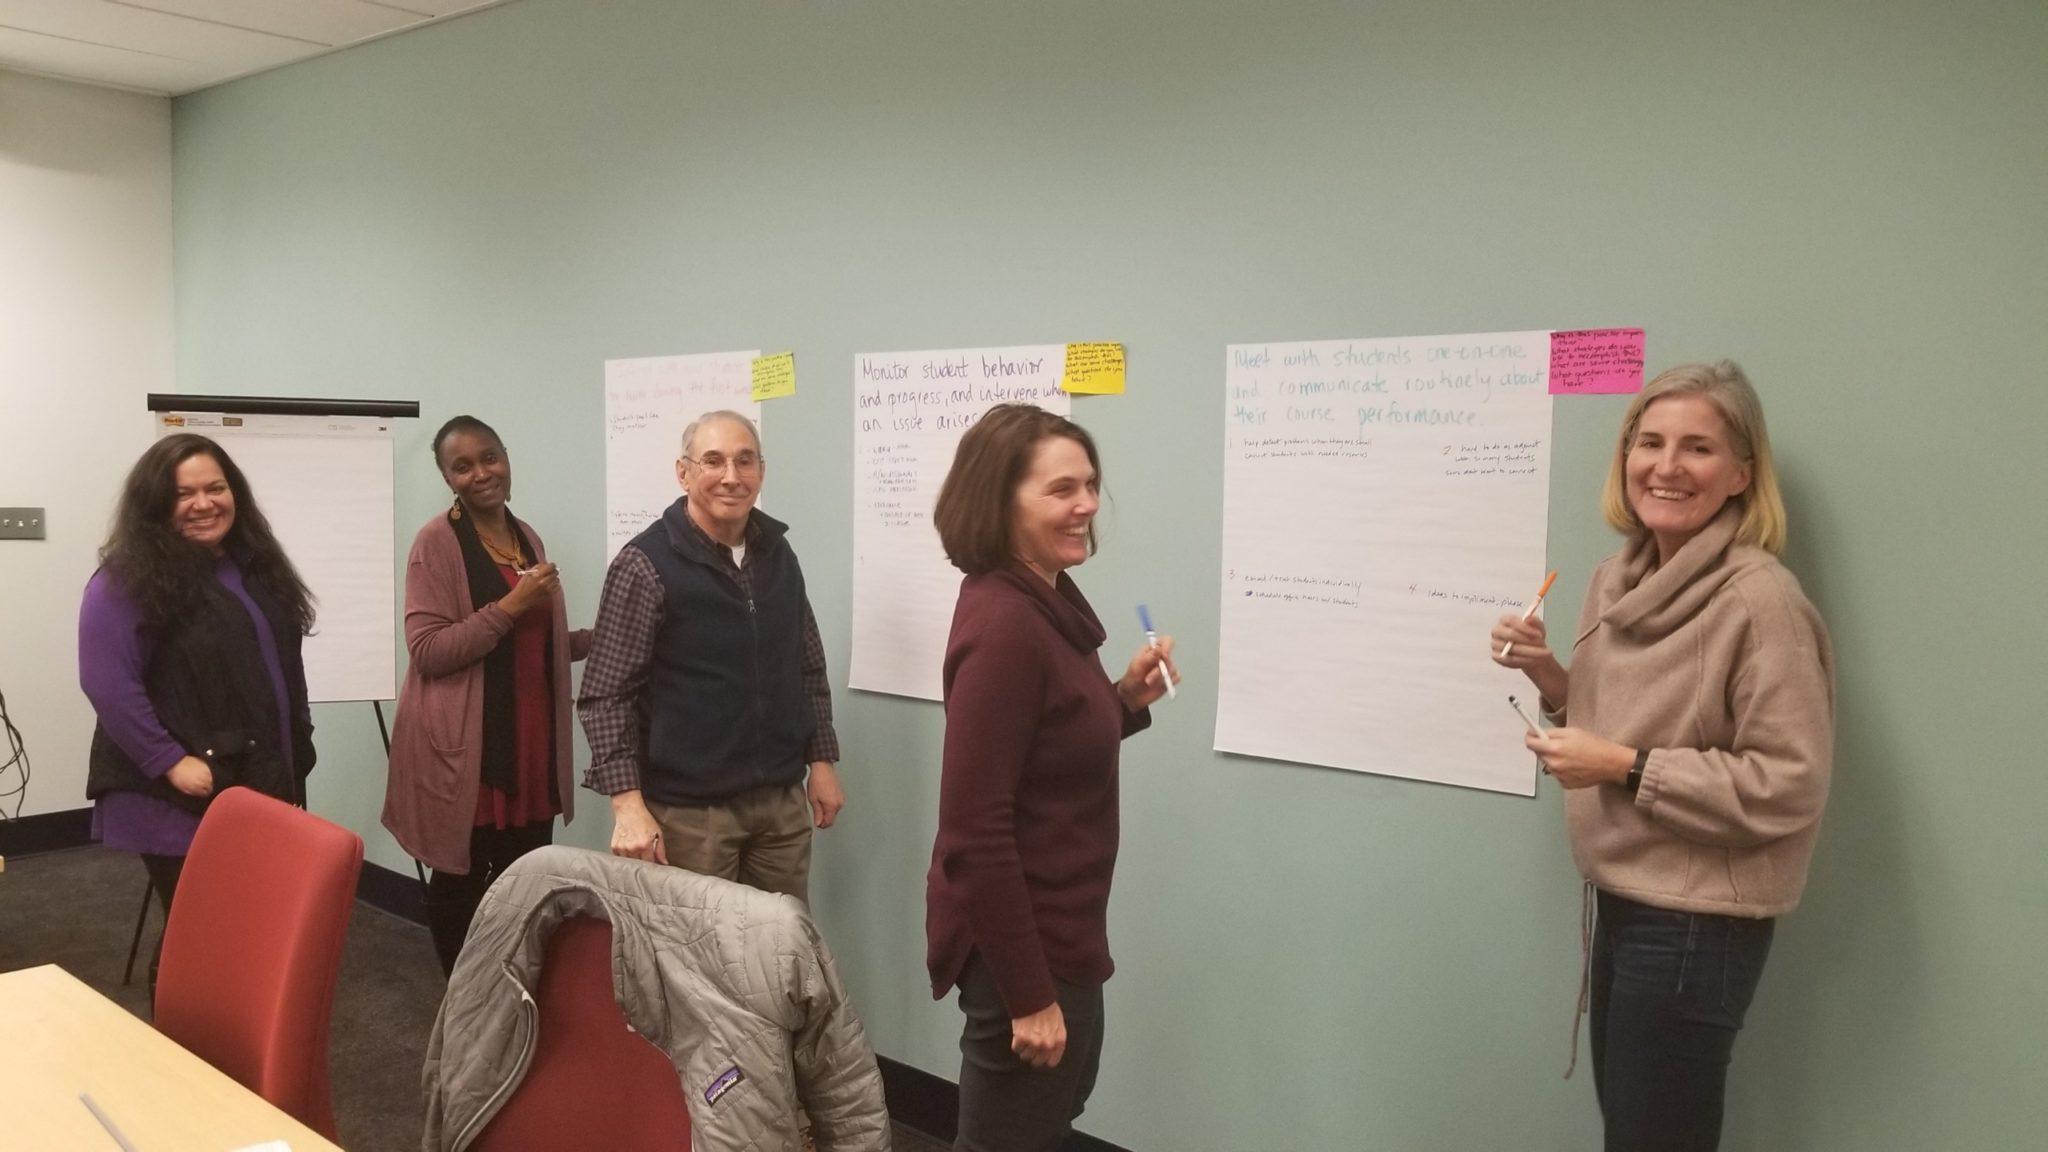 High Five Workshop Activity